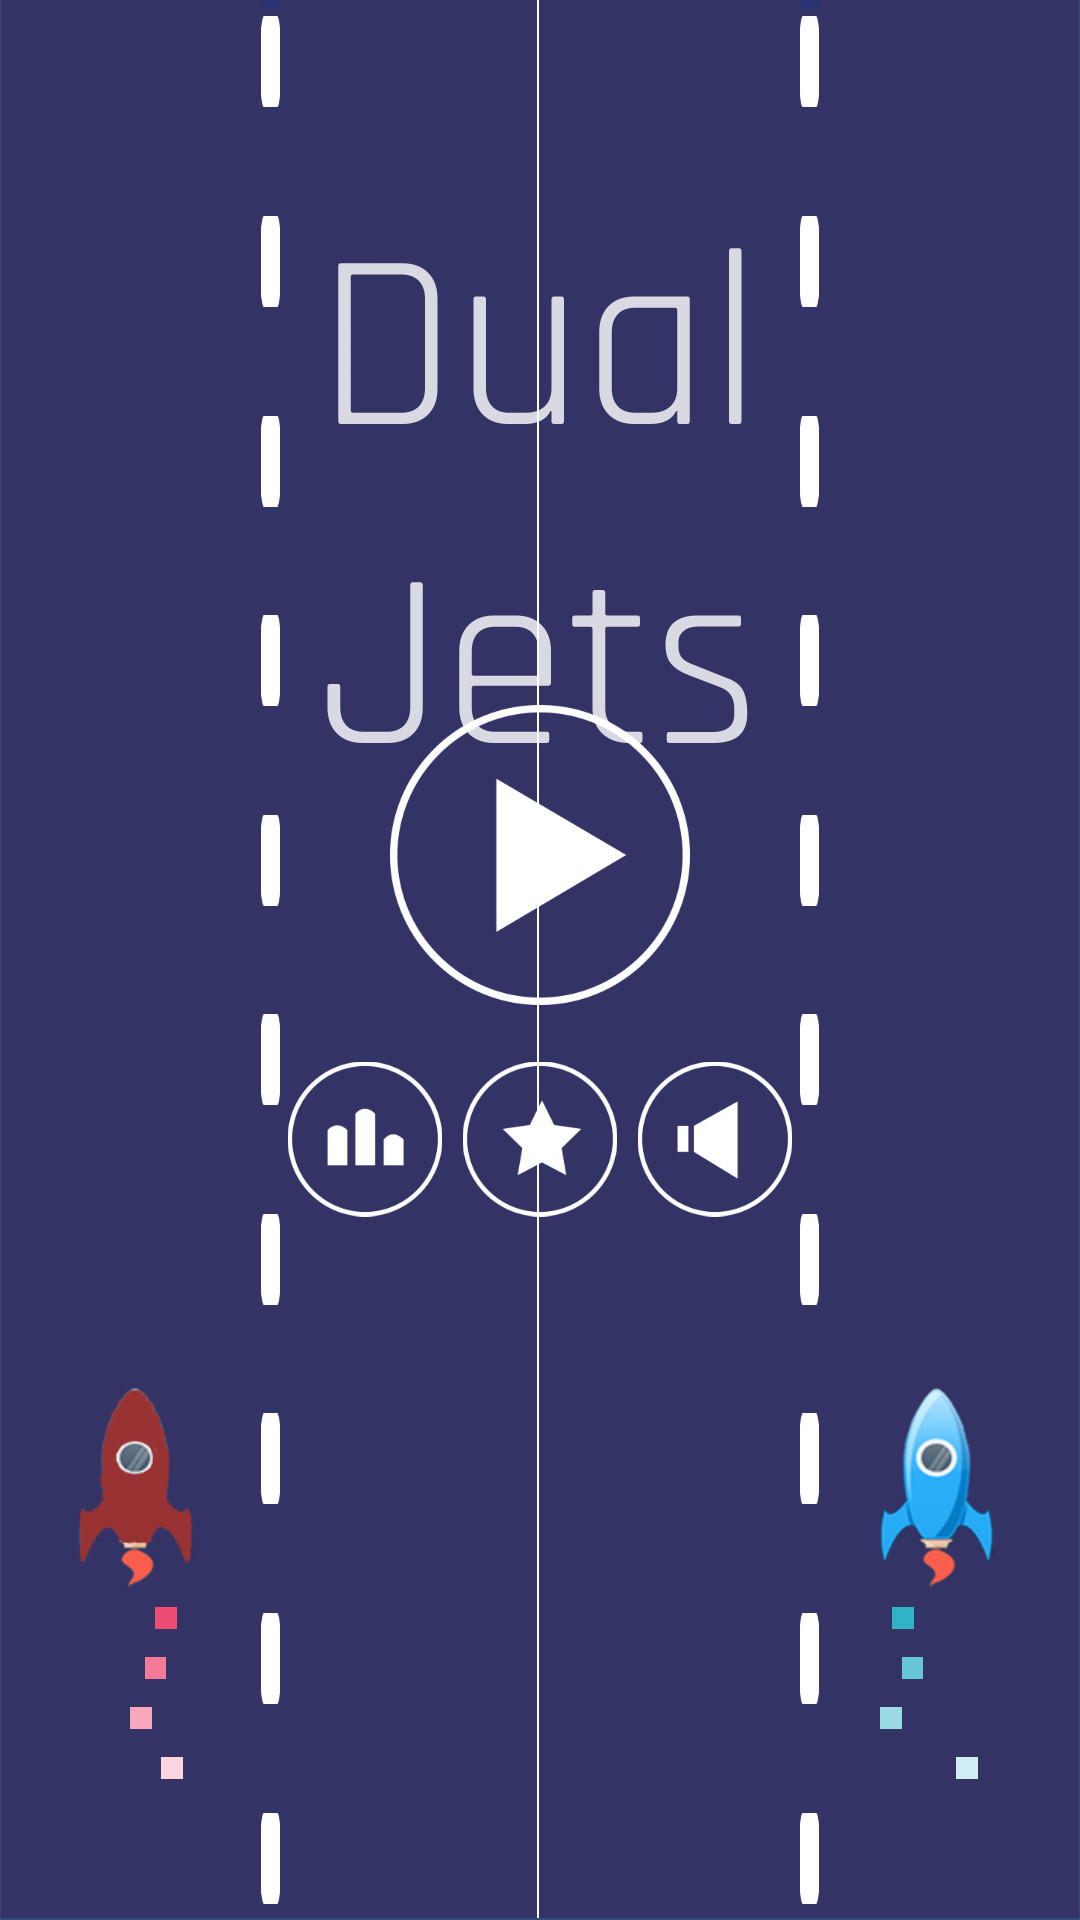 Dual Jets